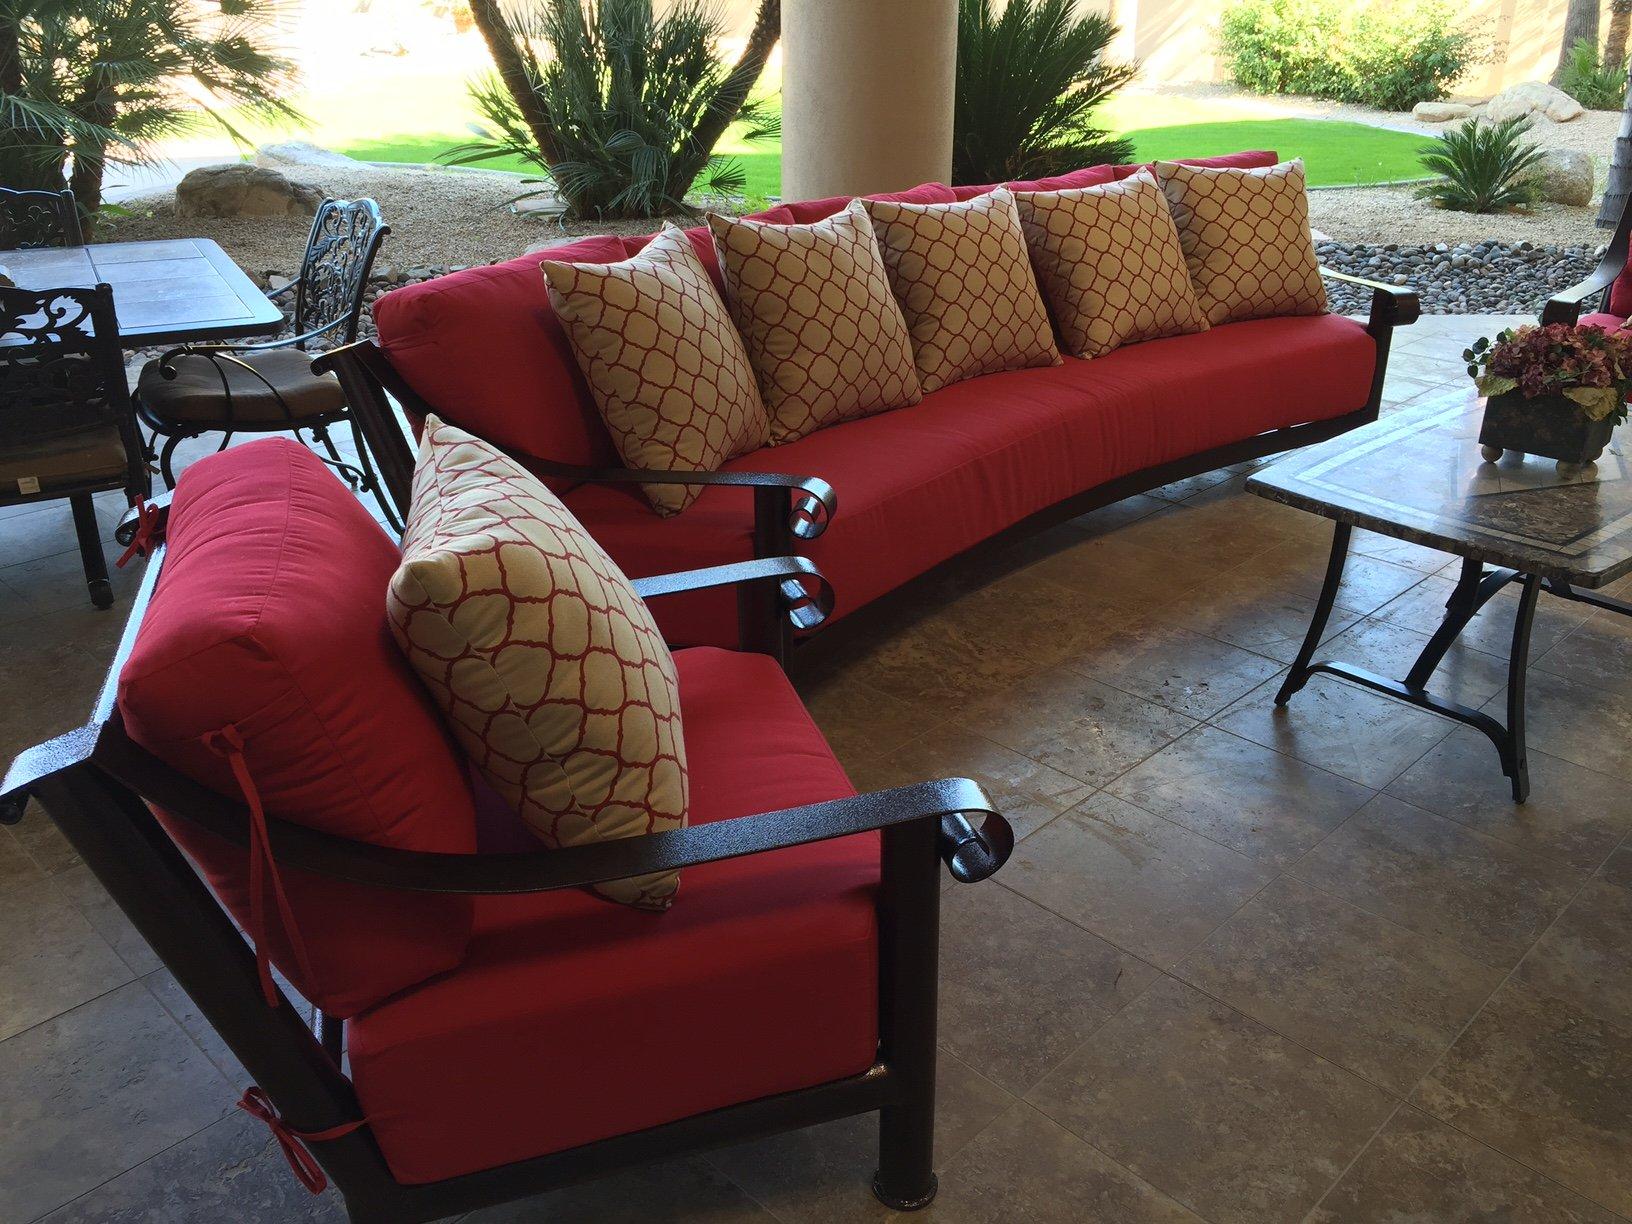 Molino Patio Furniture image 0